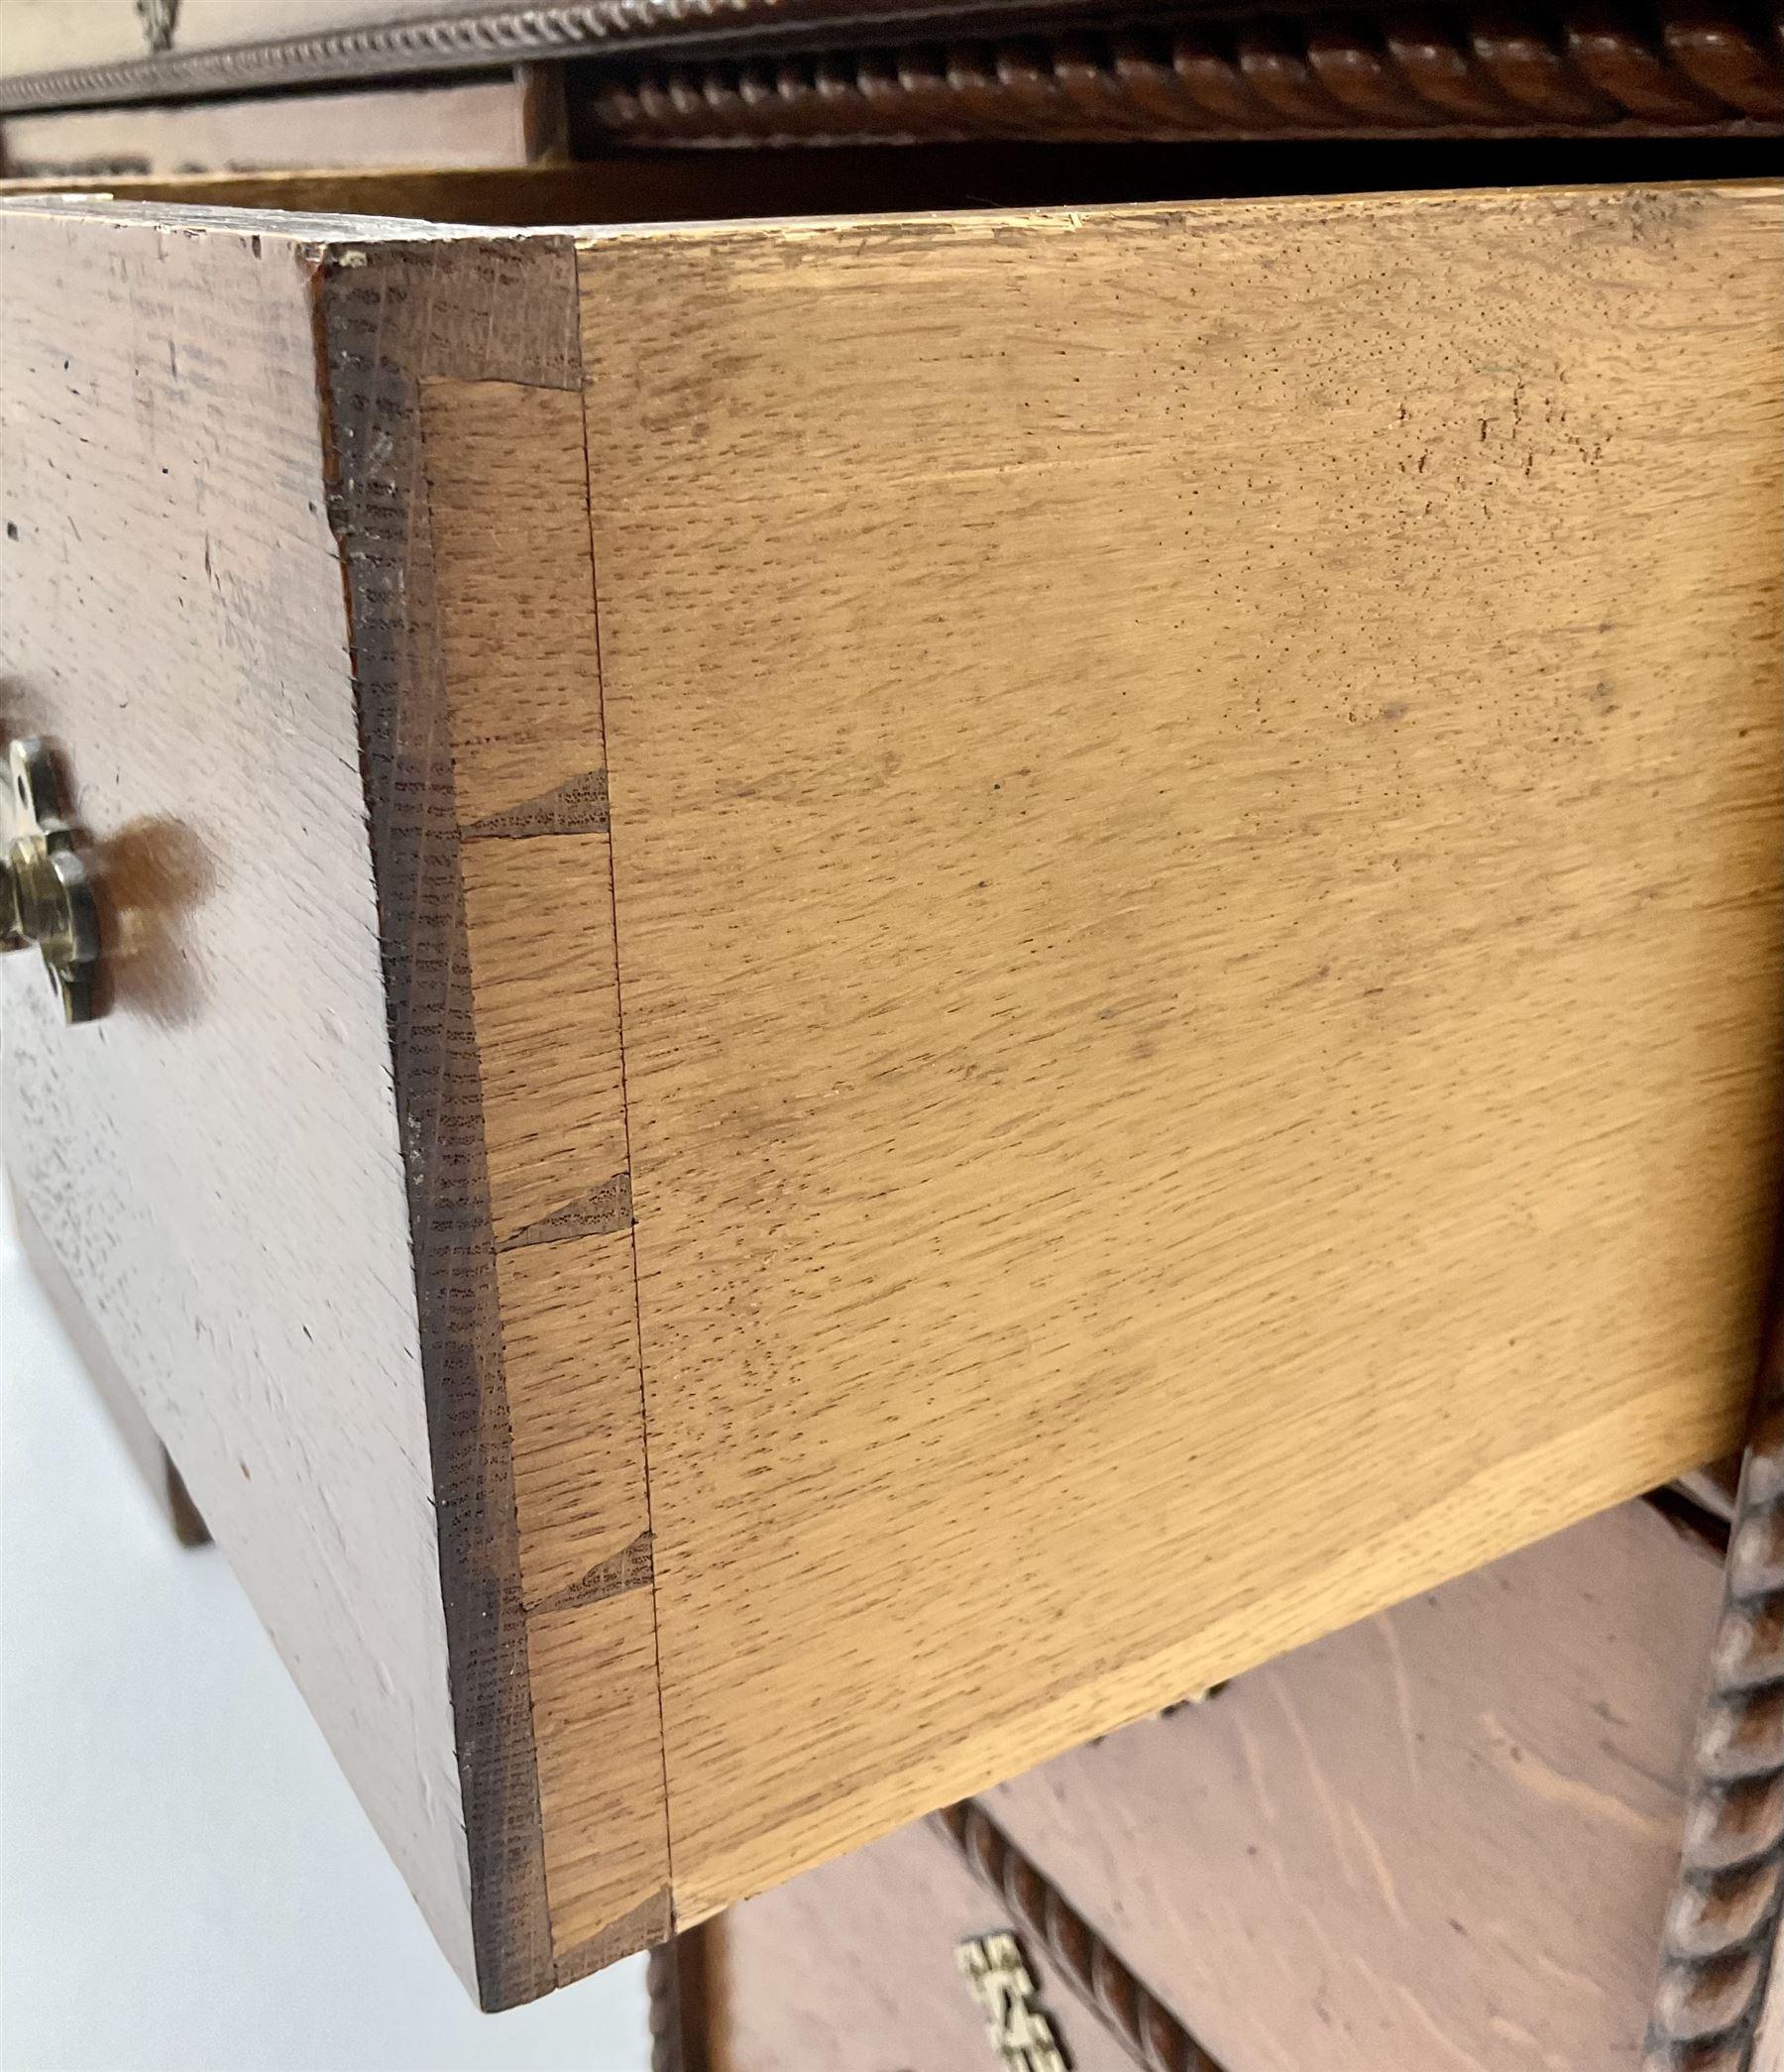 Victorian aesthetic oak movement desk - Image 6 of 7